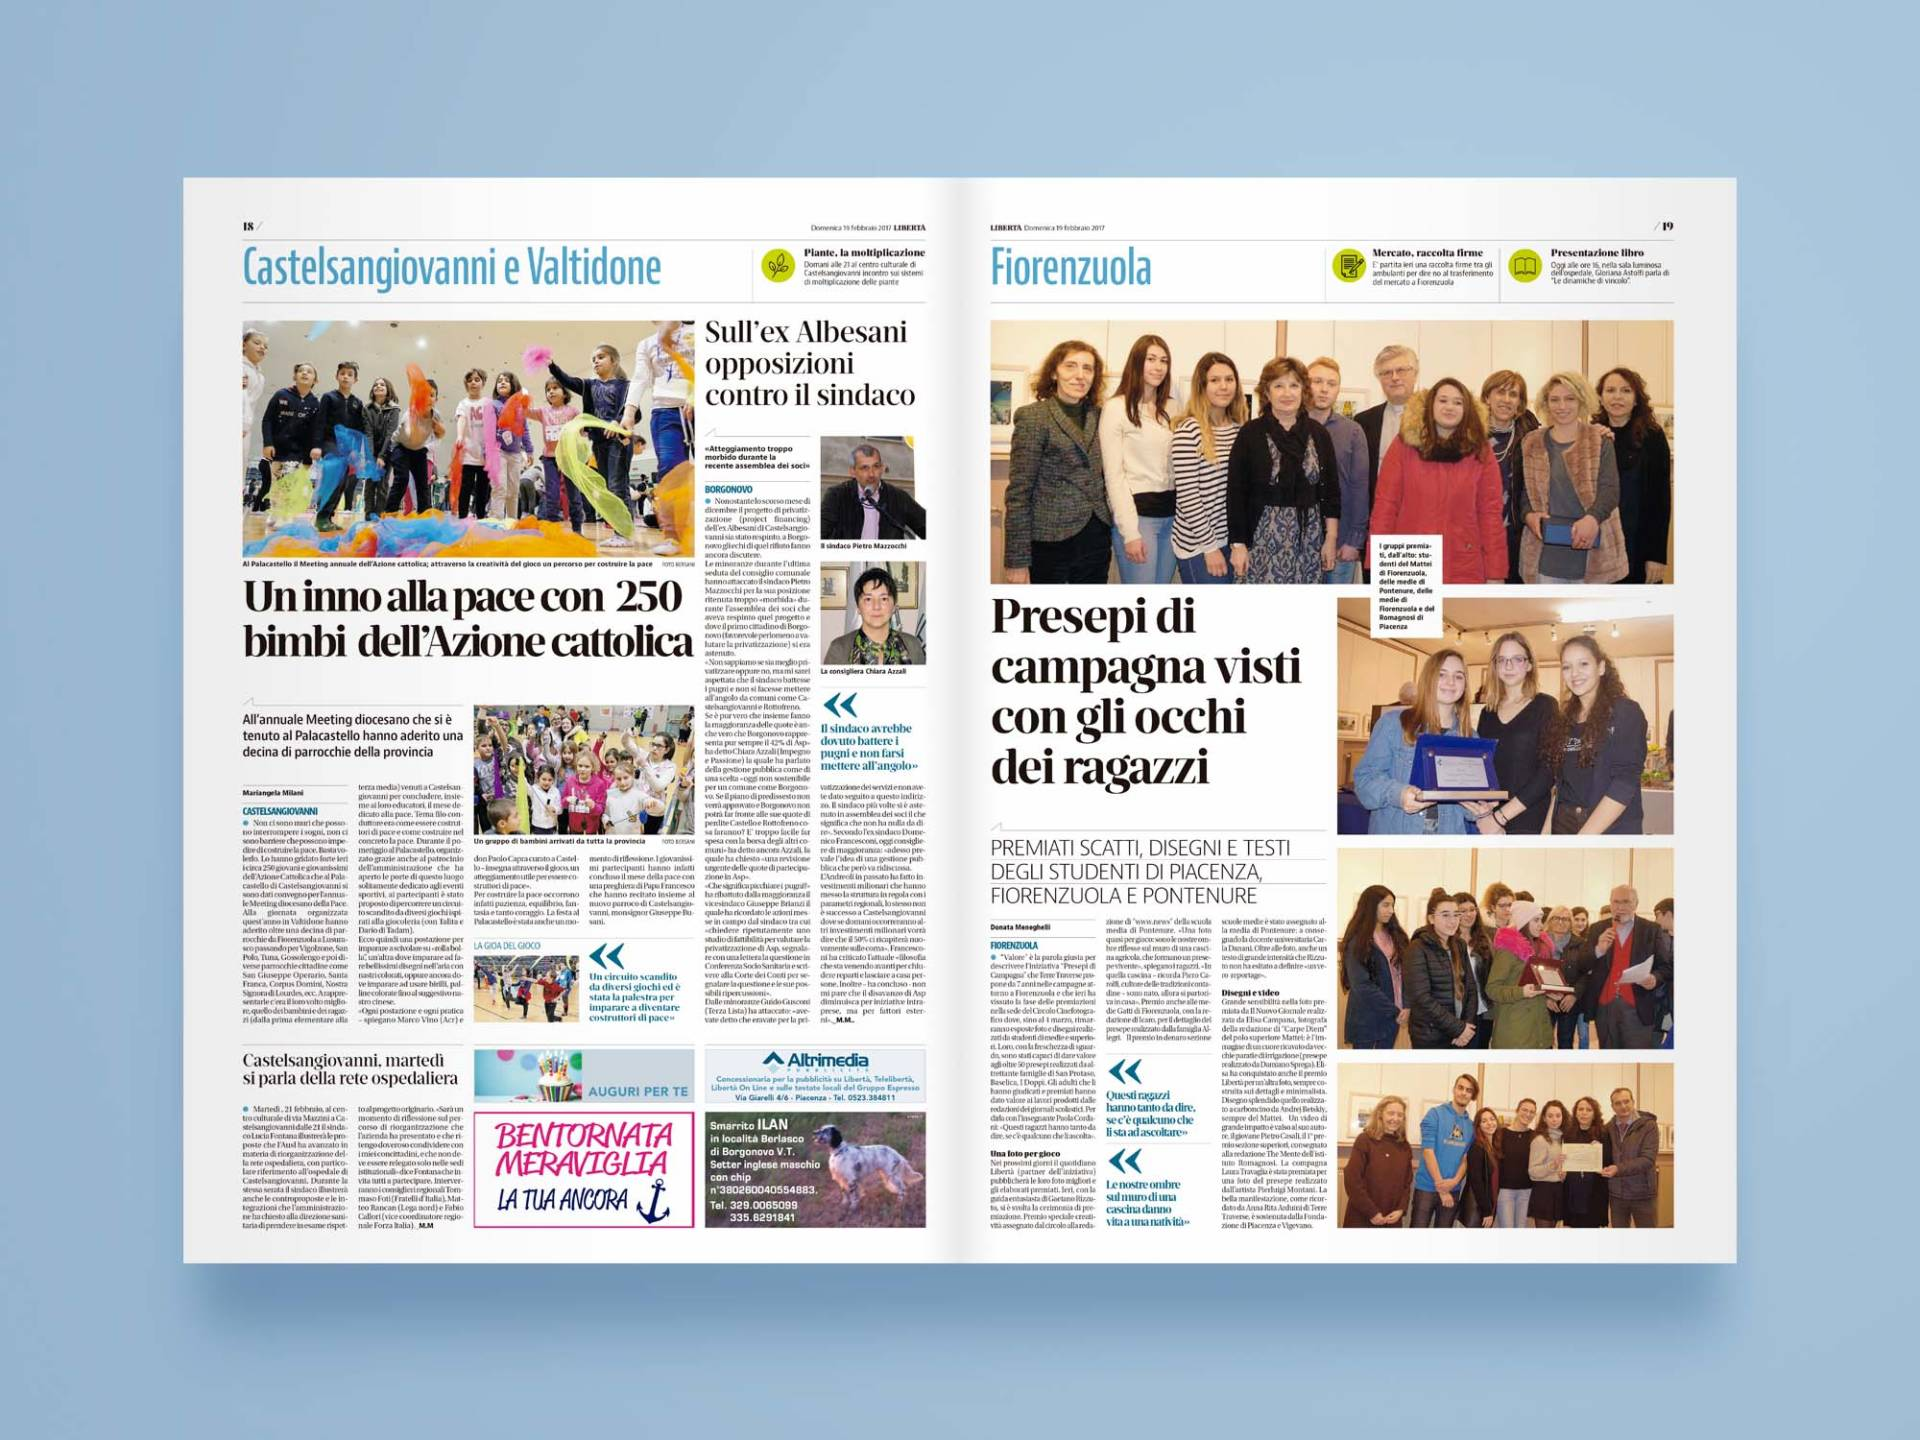 Liberta_05_Wenceslau_News_Design